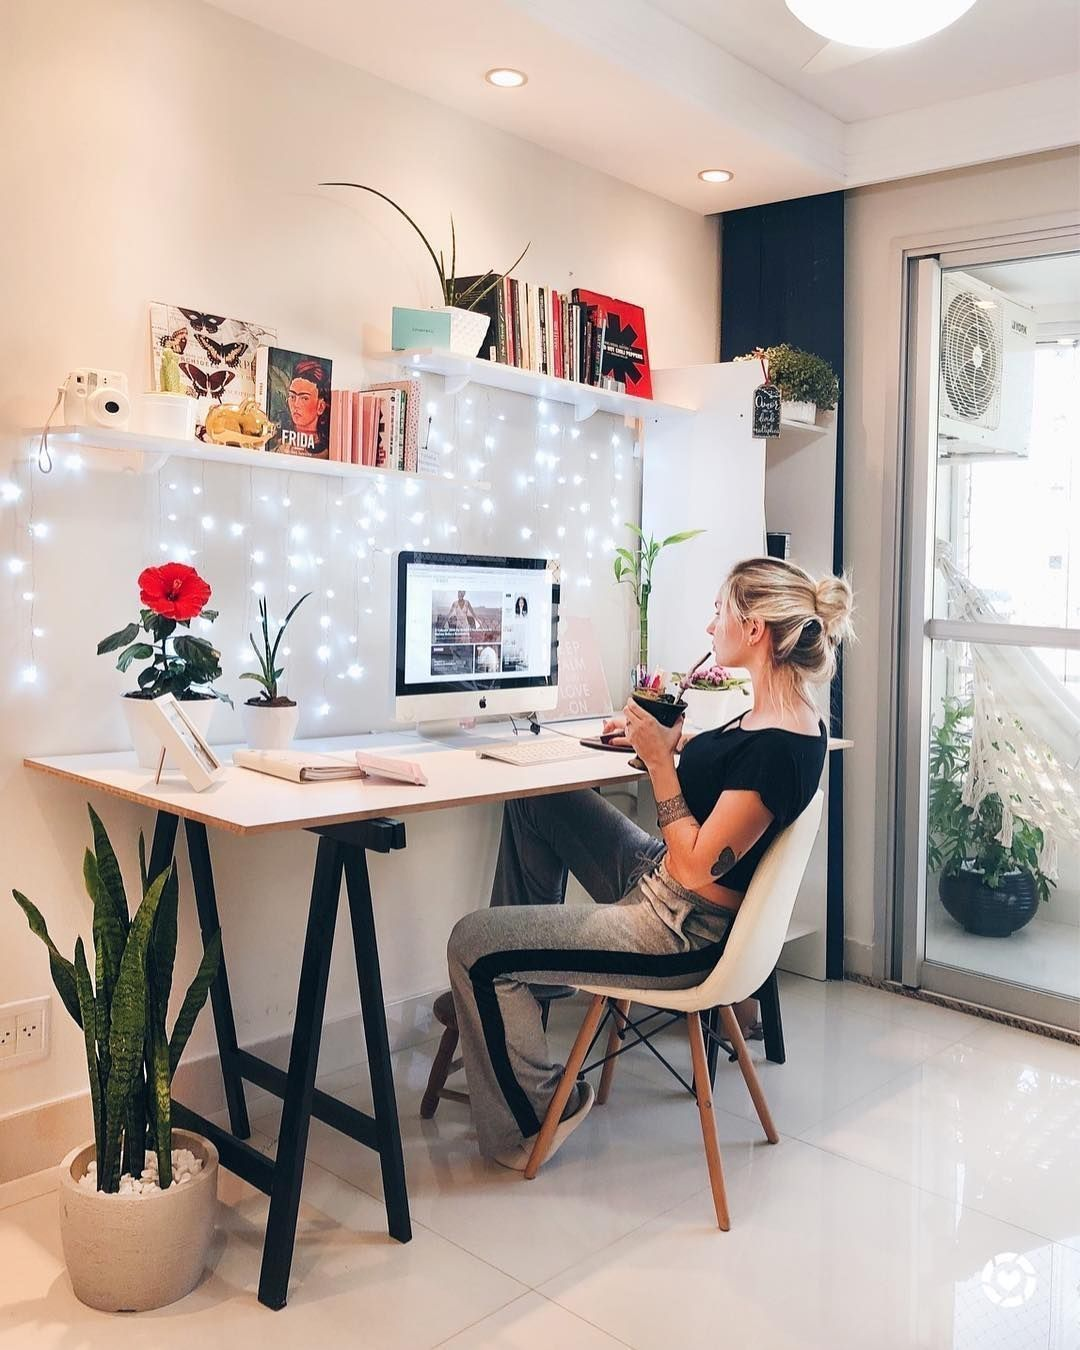 Cute Desk Decor Ideas For Your Dorm Or Office Deskofficeideas Homedecor Homeofficeideas Office Home Office Decor Home Decor Room Decor